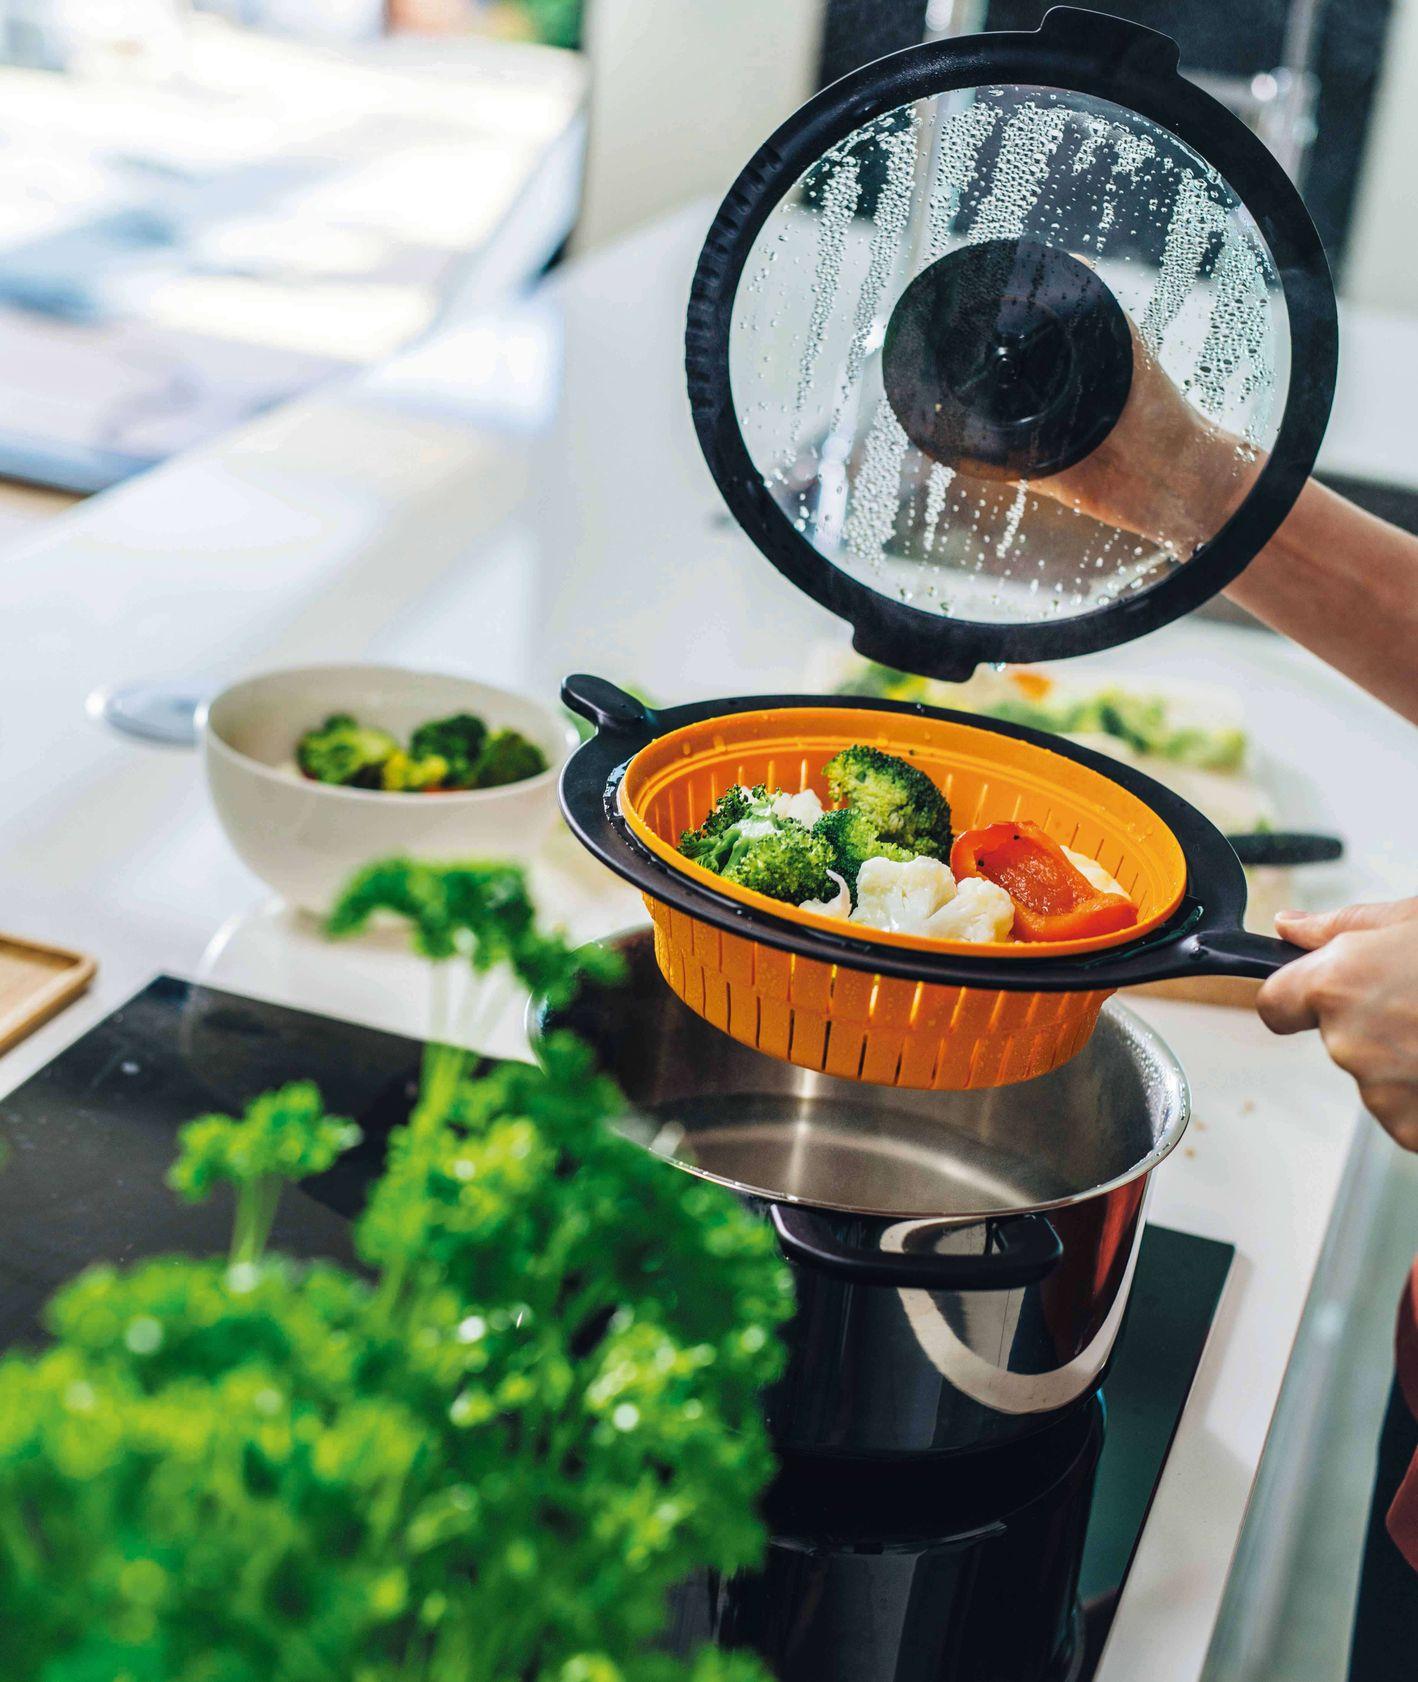 Akcesoria kuchenne marki Fiskars – durszlak (fot. materiały prasowe)